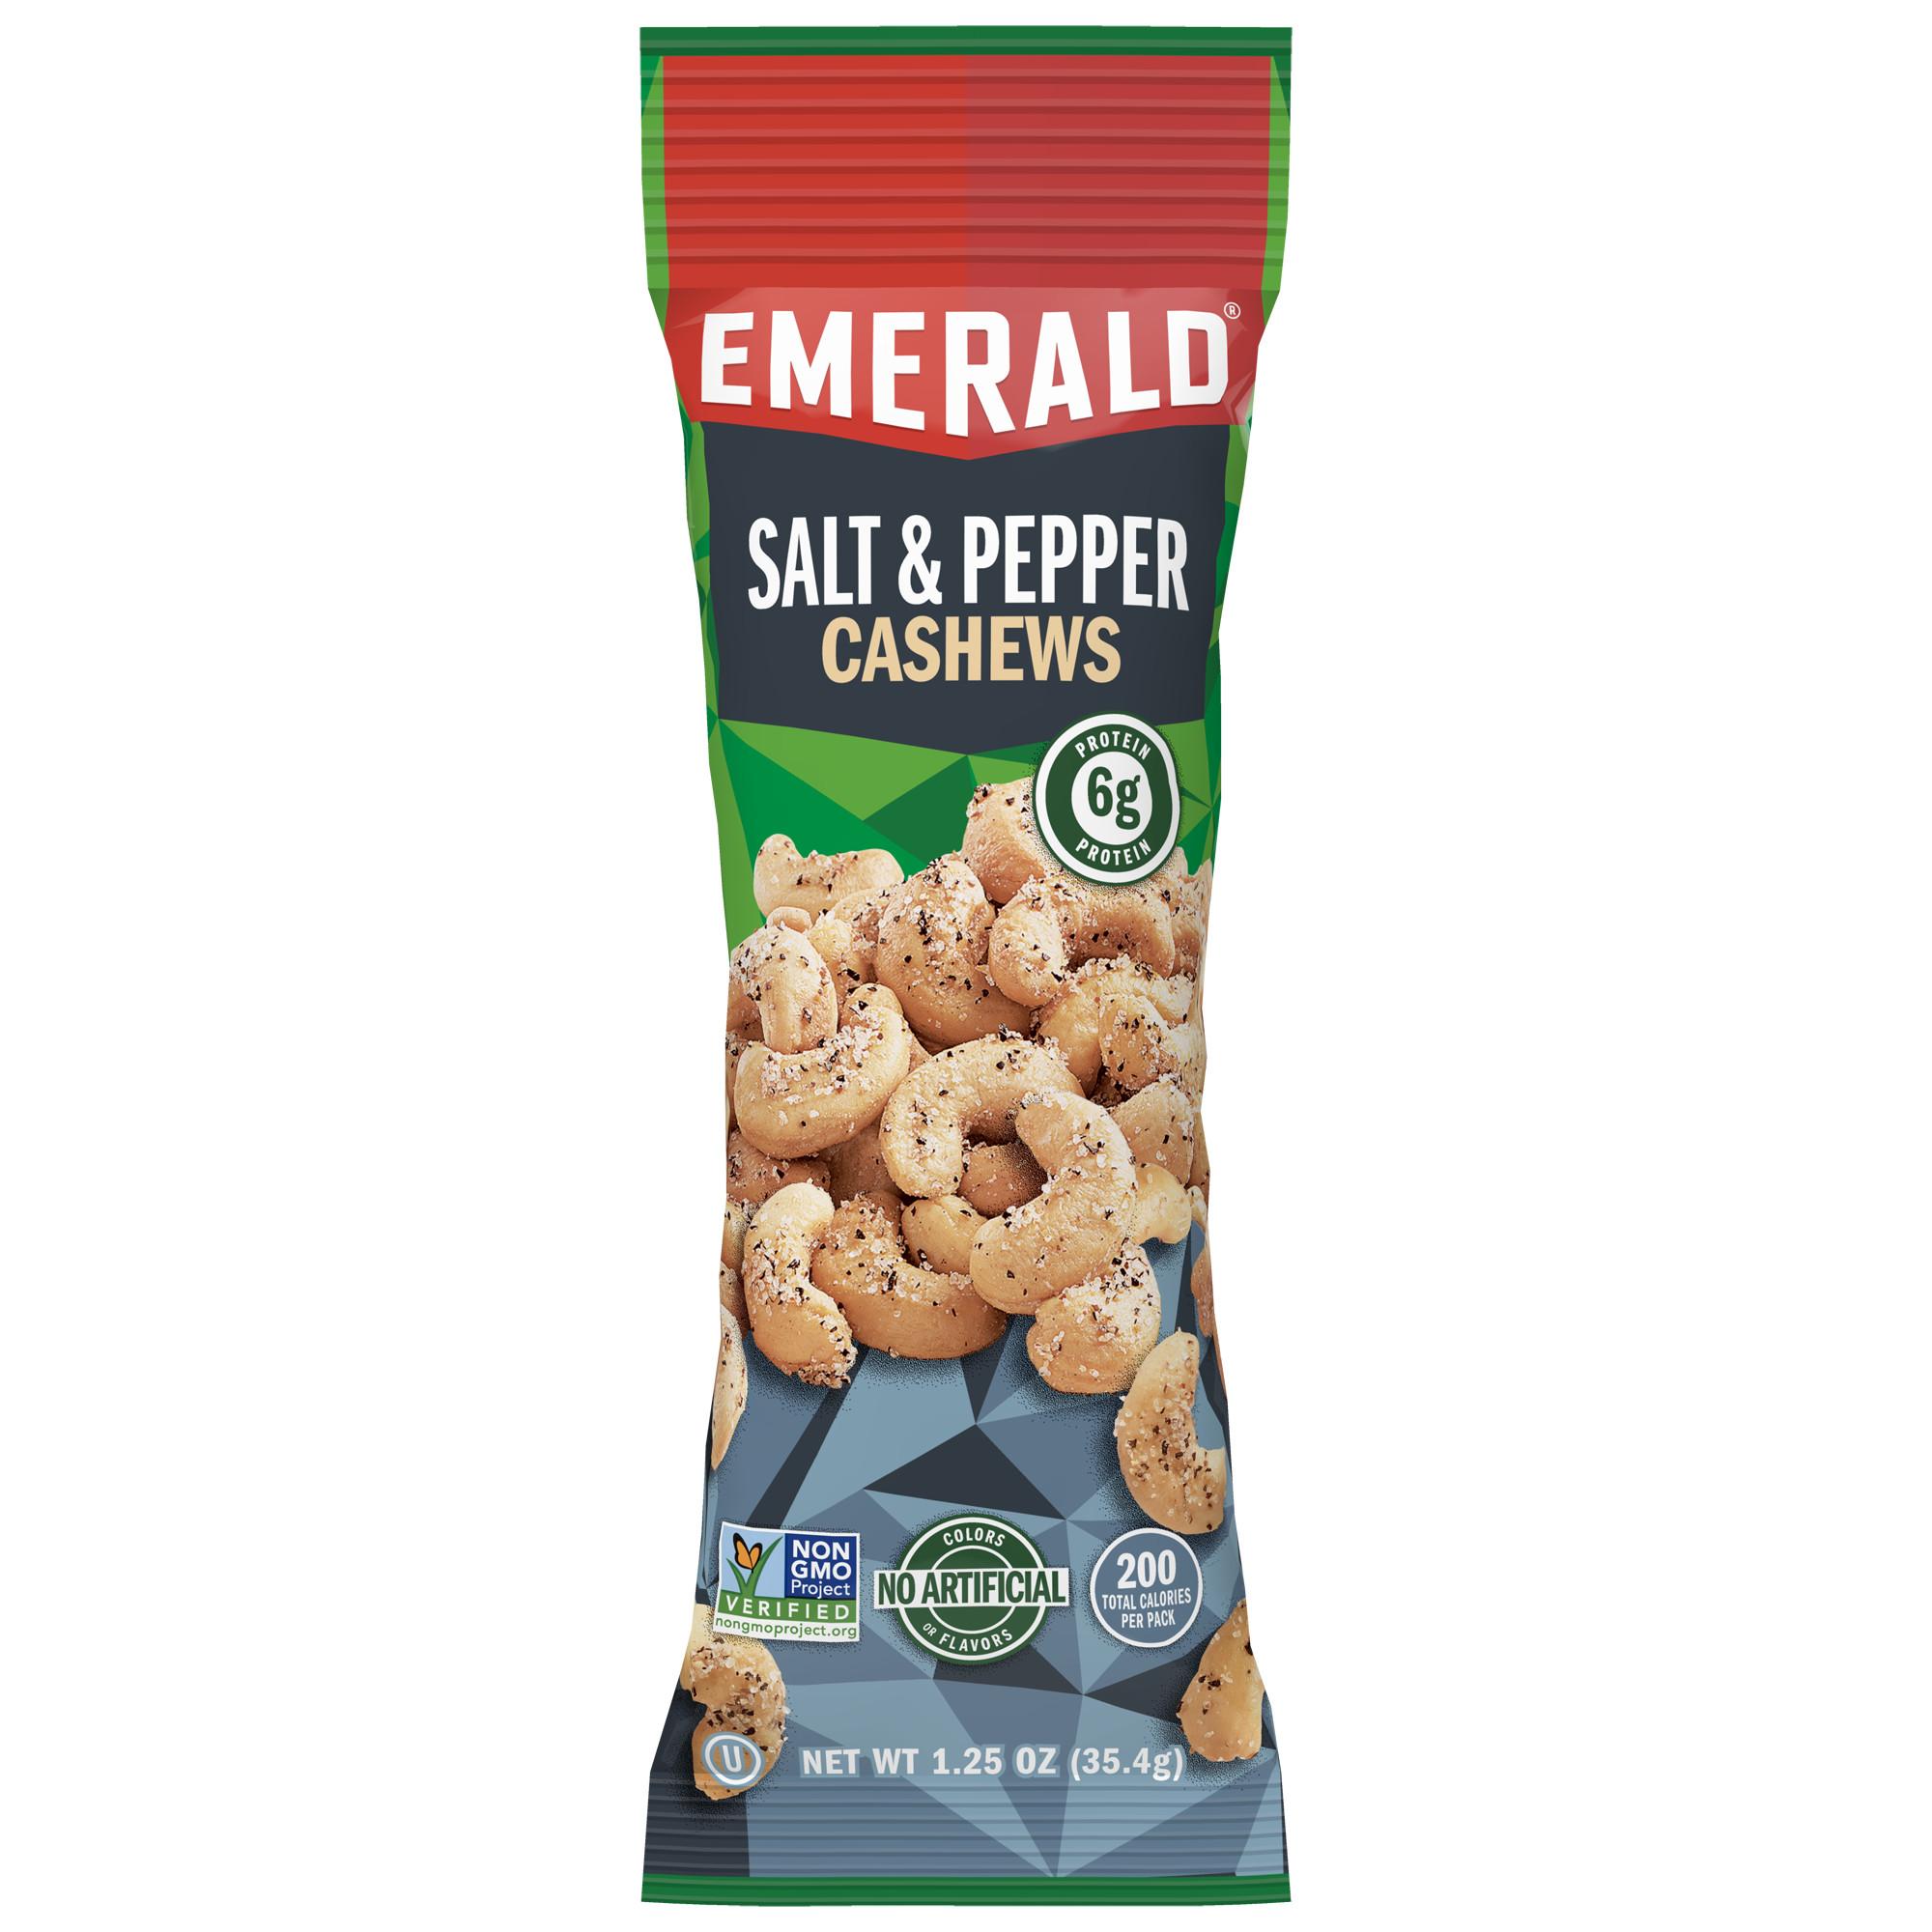 Emerald Nuts Salt and Pepper Cashews, Single-Serve 1.25 Oz, 12 Ct